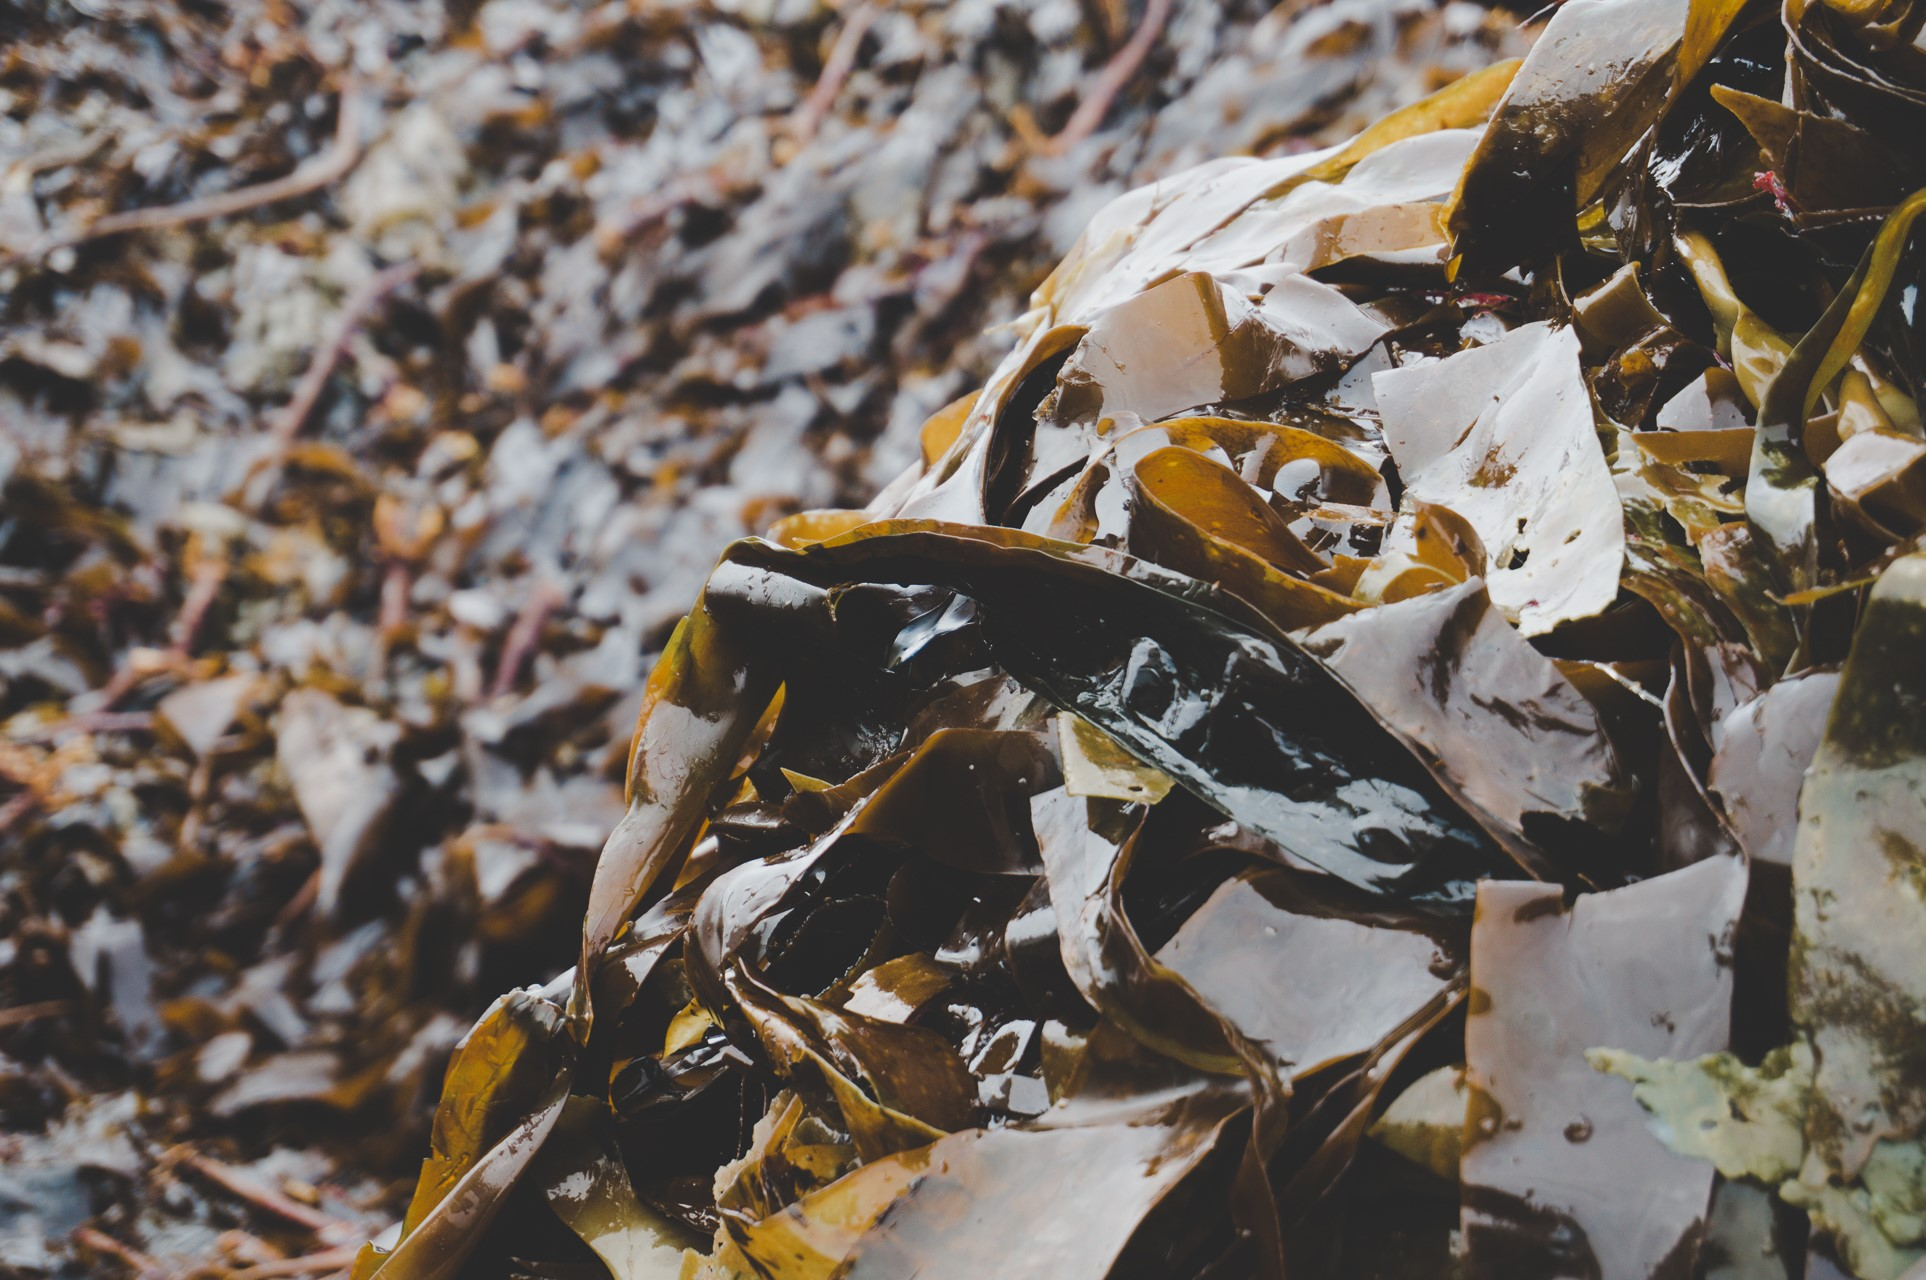 Image credit - Skipping Rocks Lab